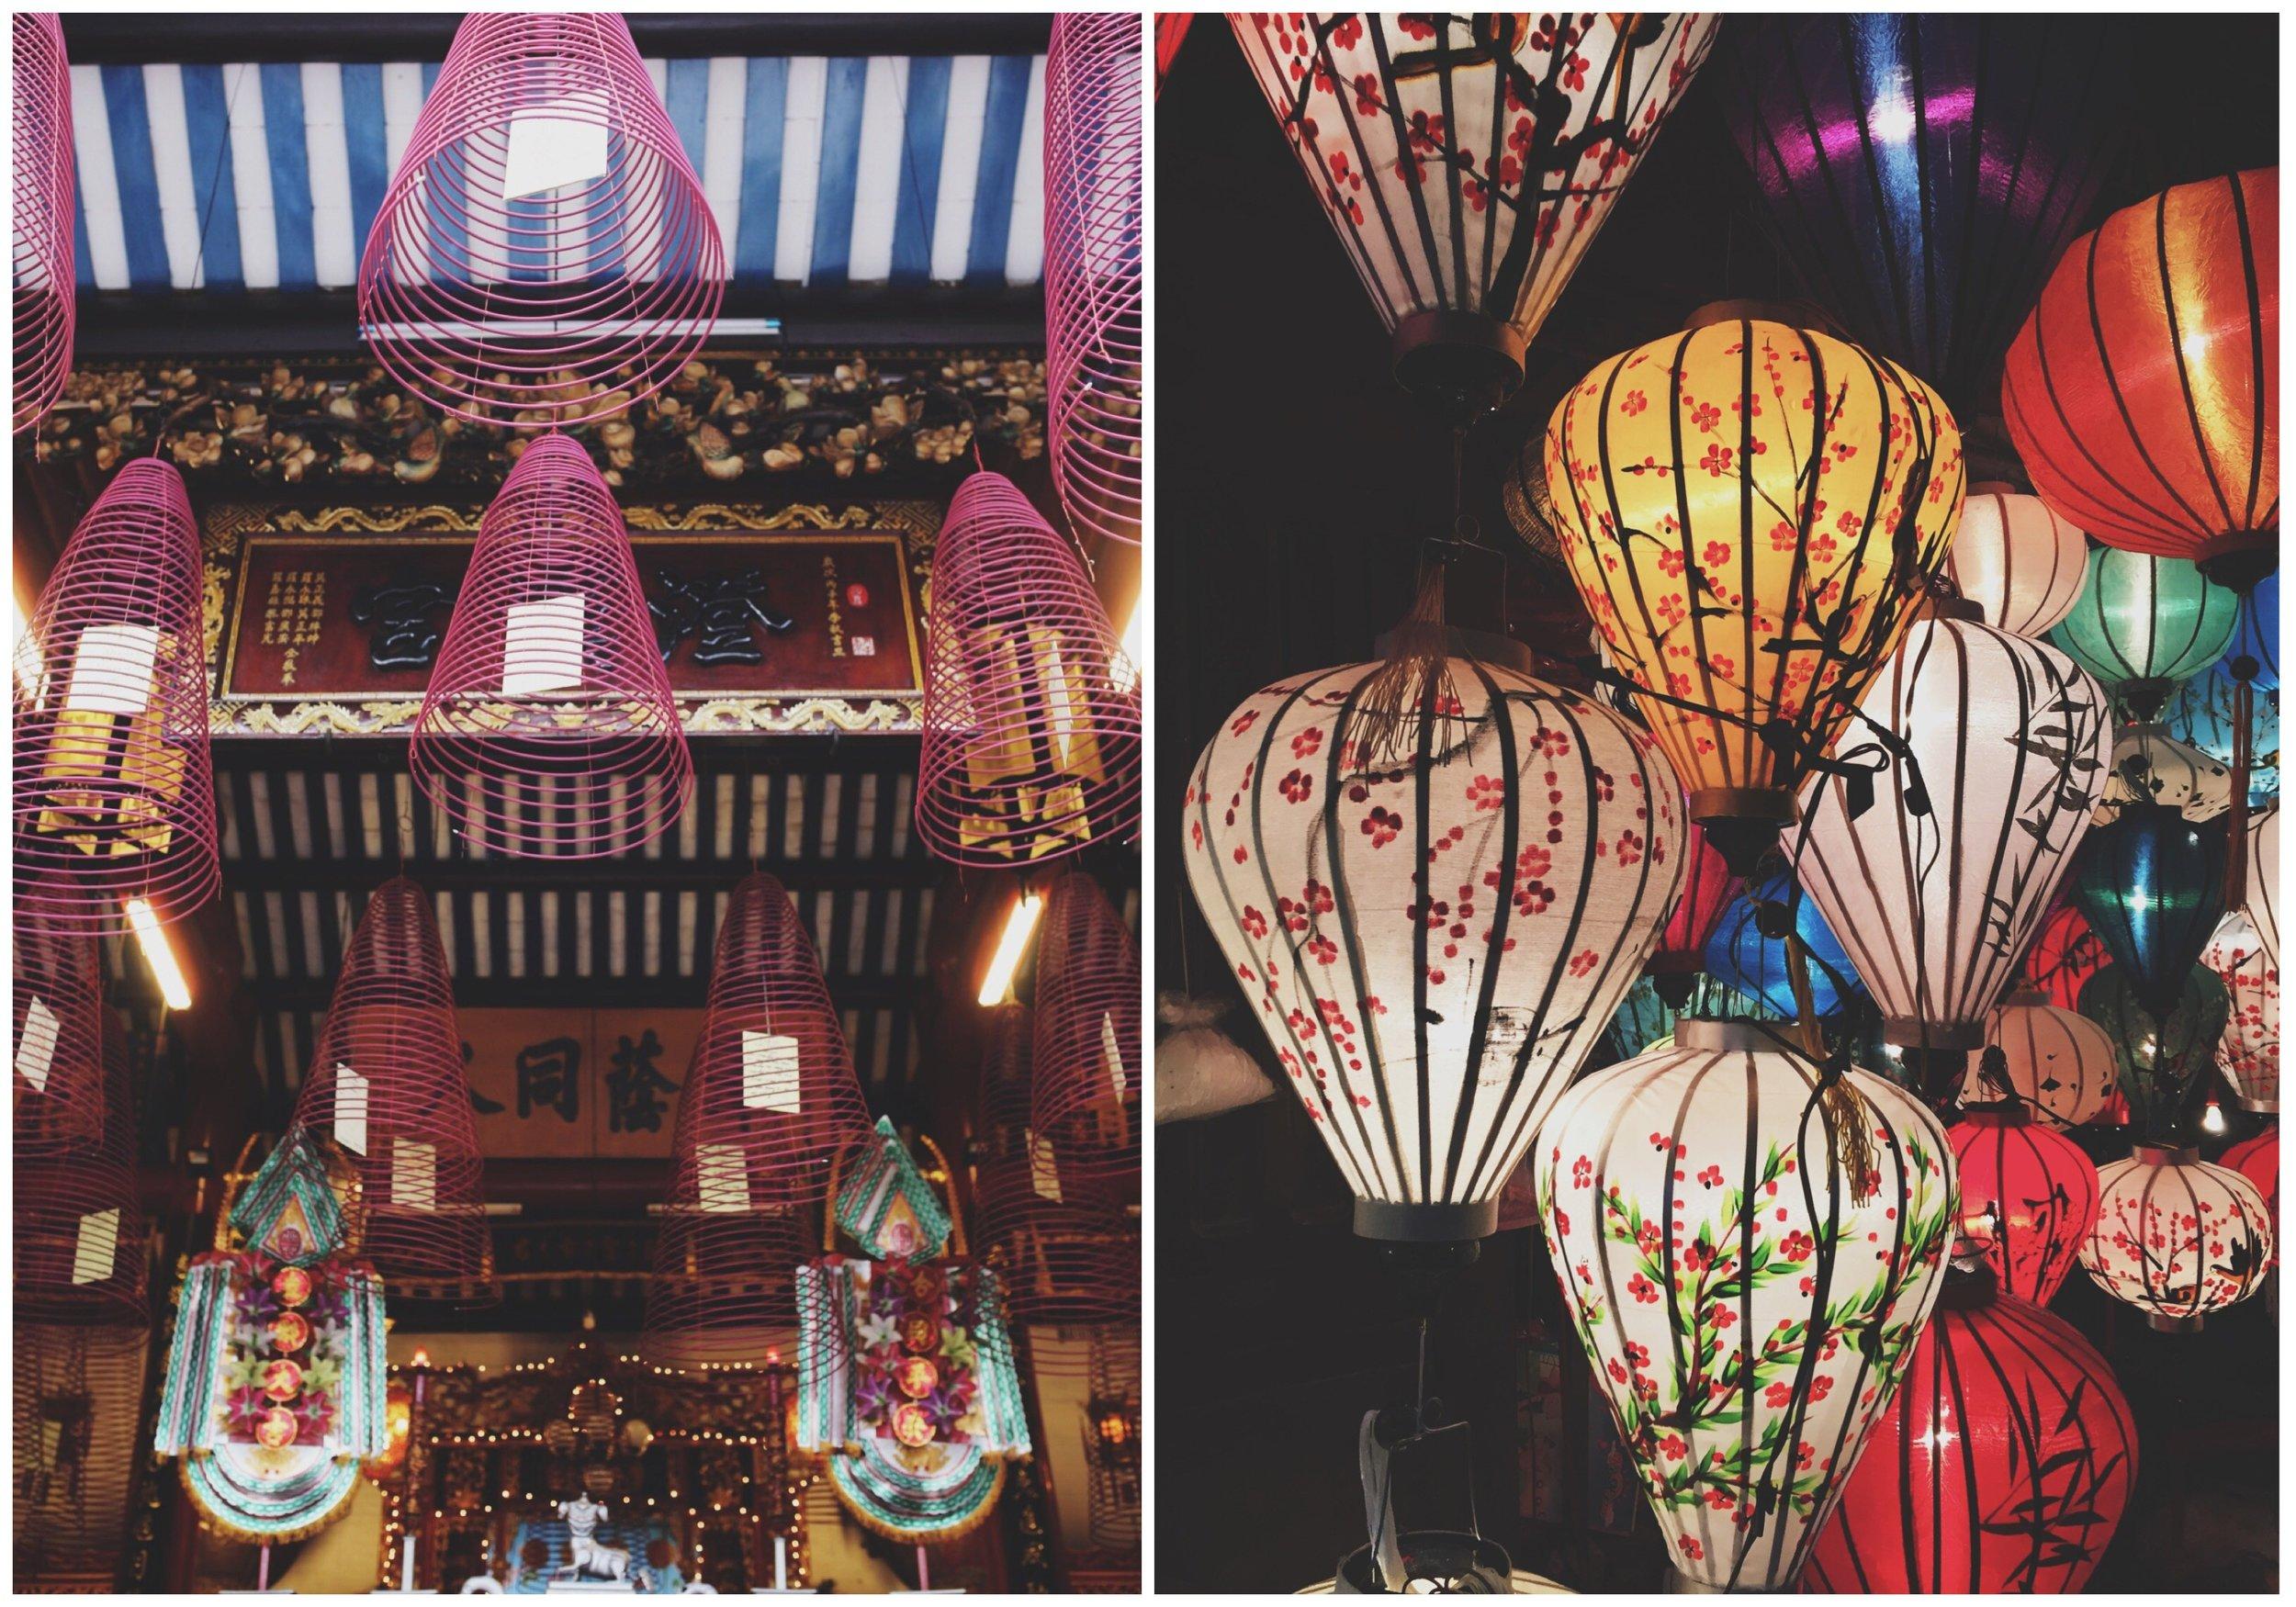 hoian-lanternes-voyage-vietnam.JPG